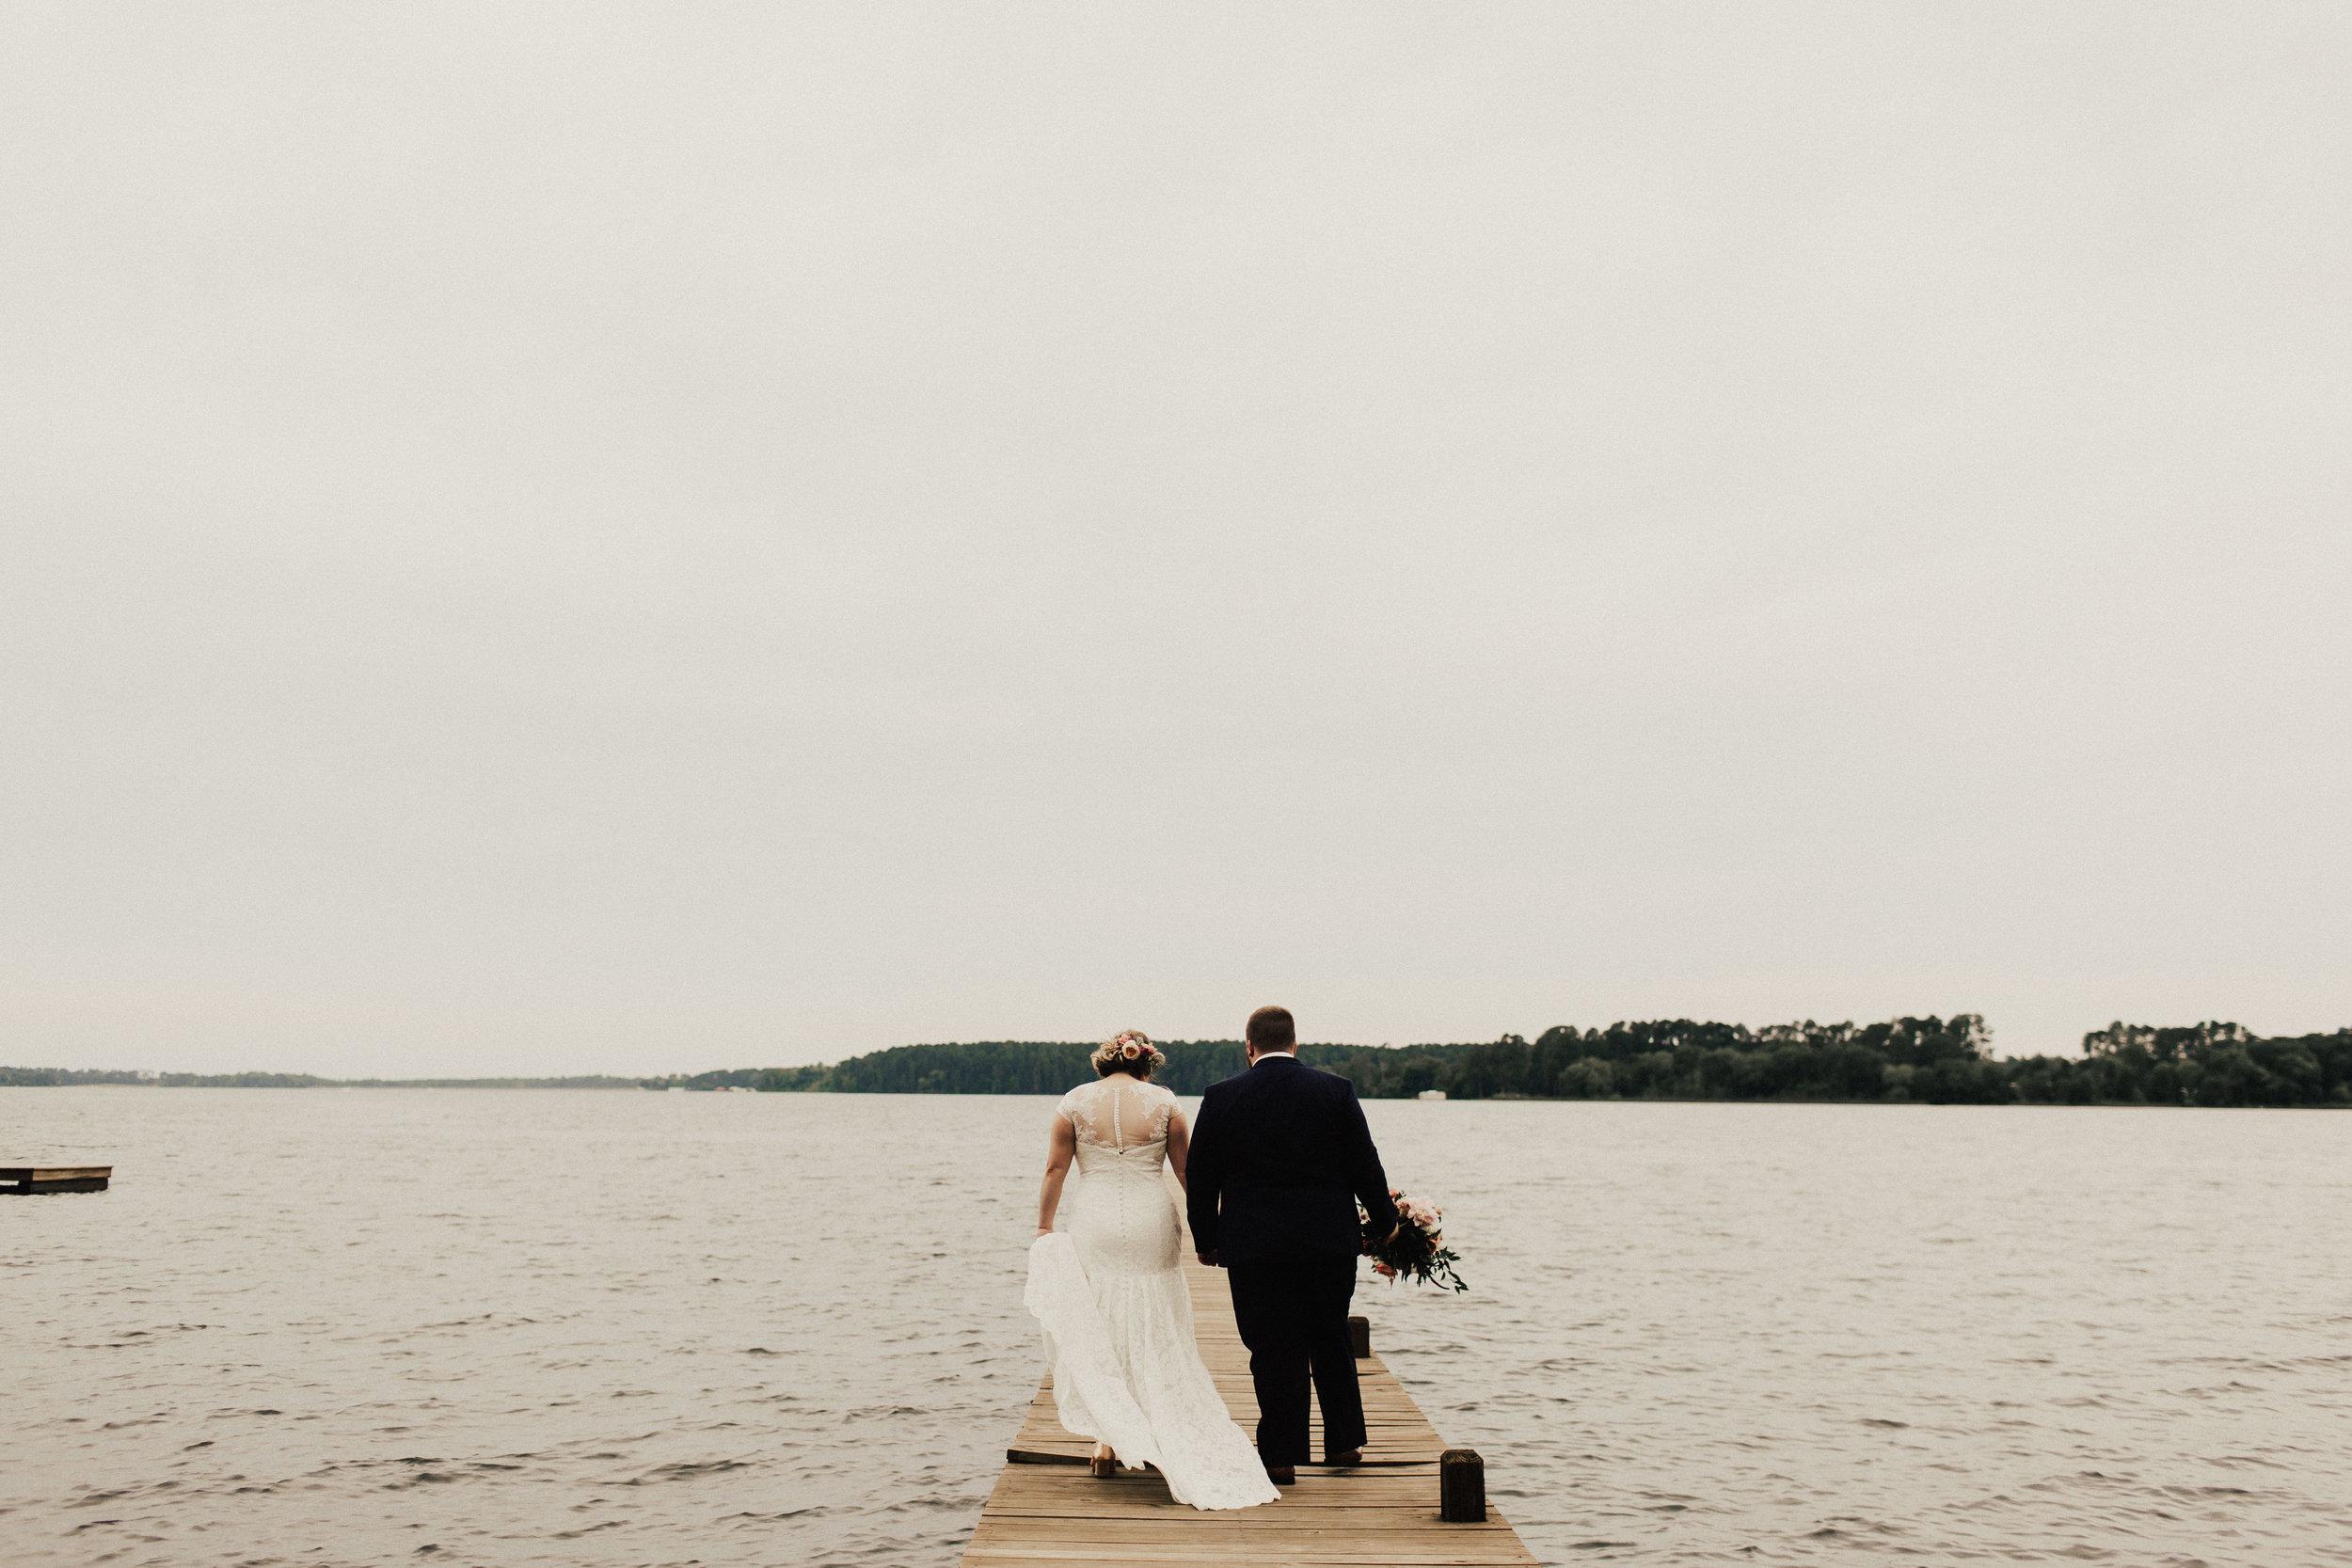 caitlin-jackson-wedding-photographer-lake-tyler-petroleum-club-texas--548.jpg